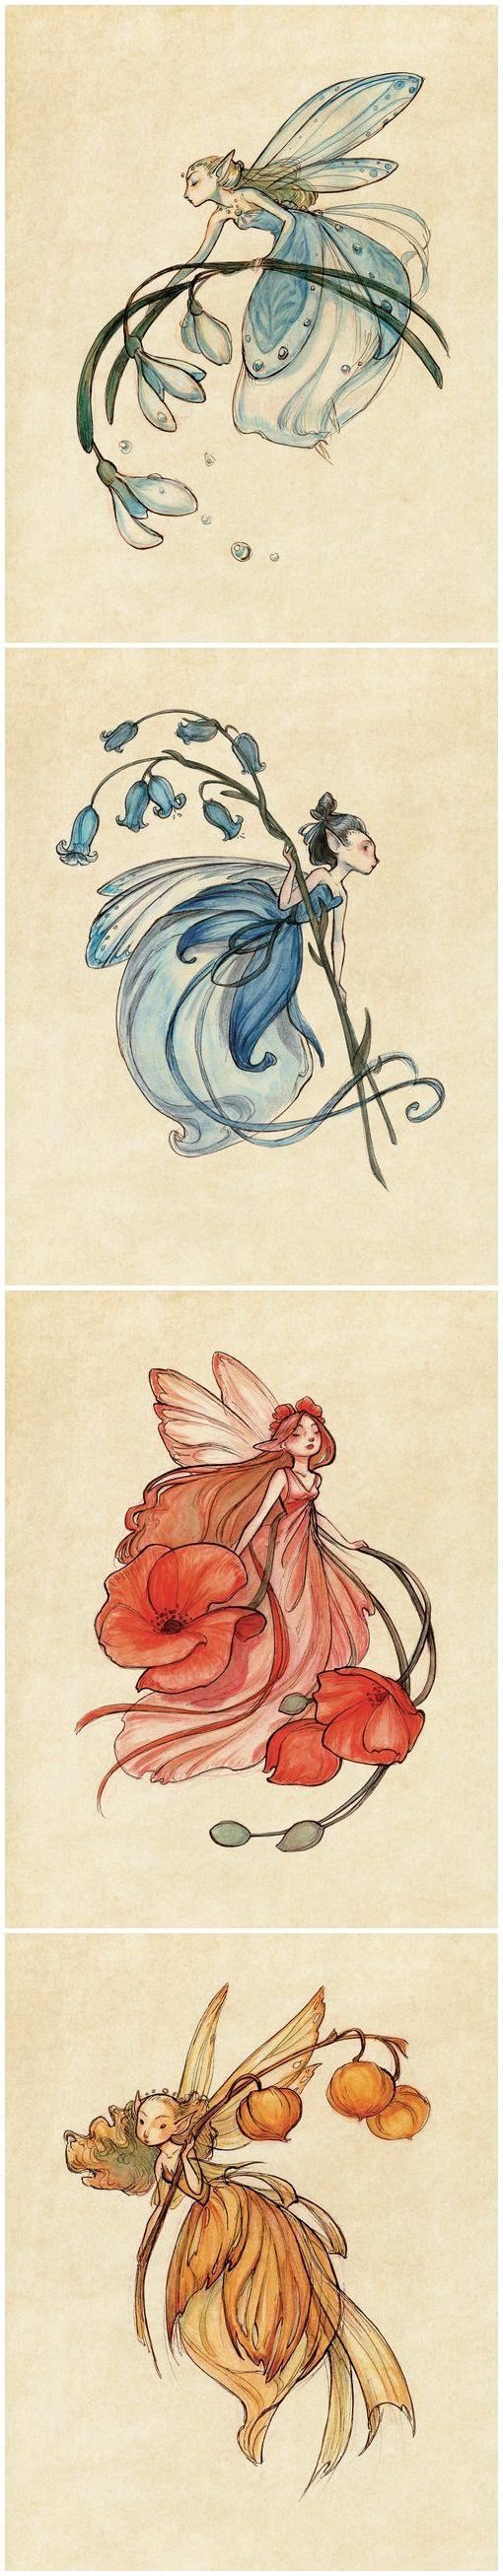 Illustrations by Casey Robin